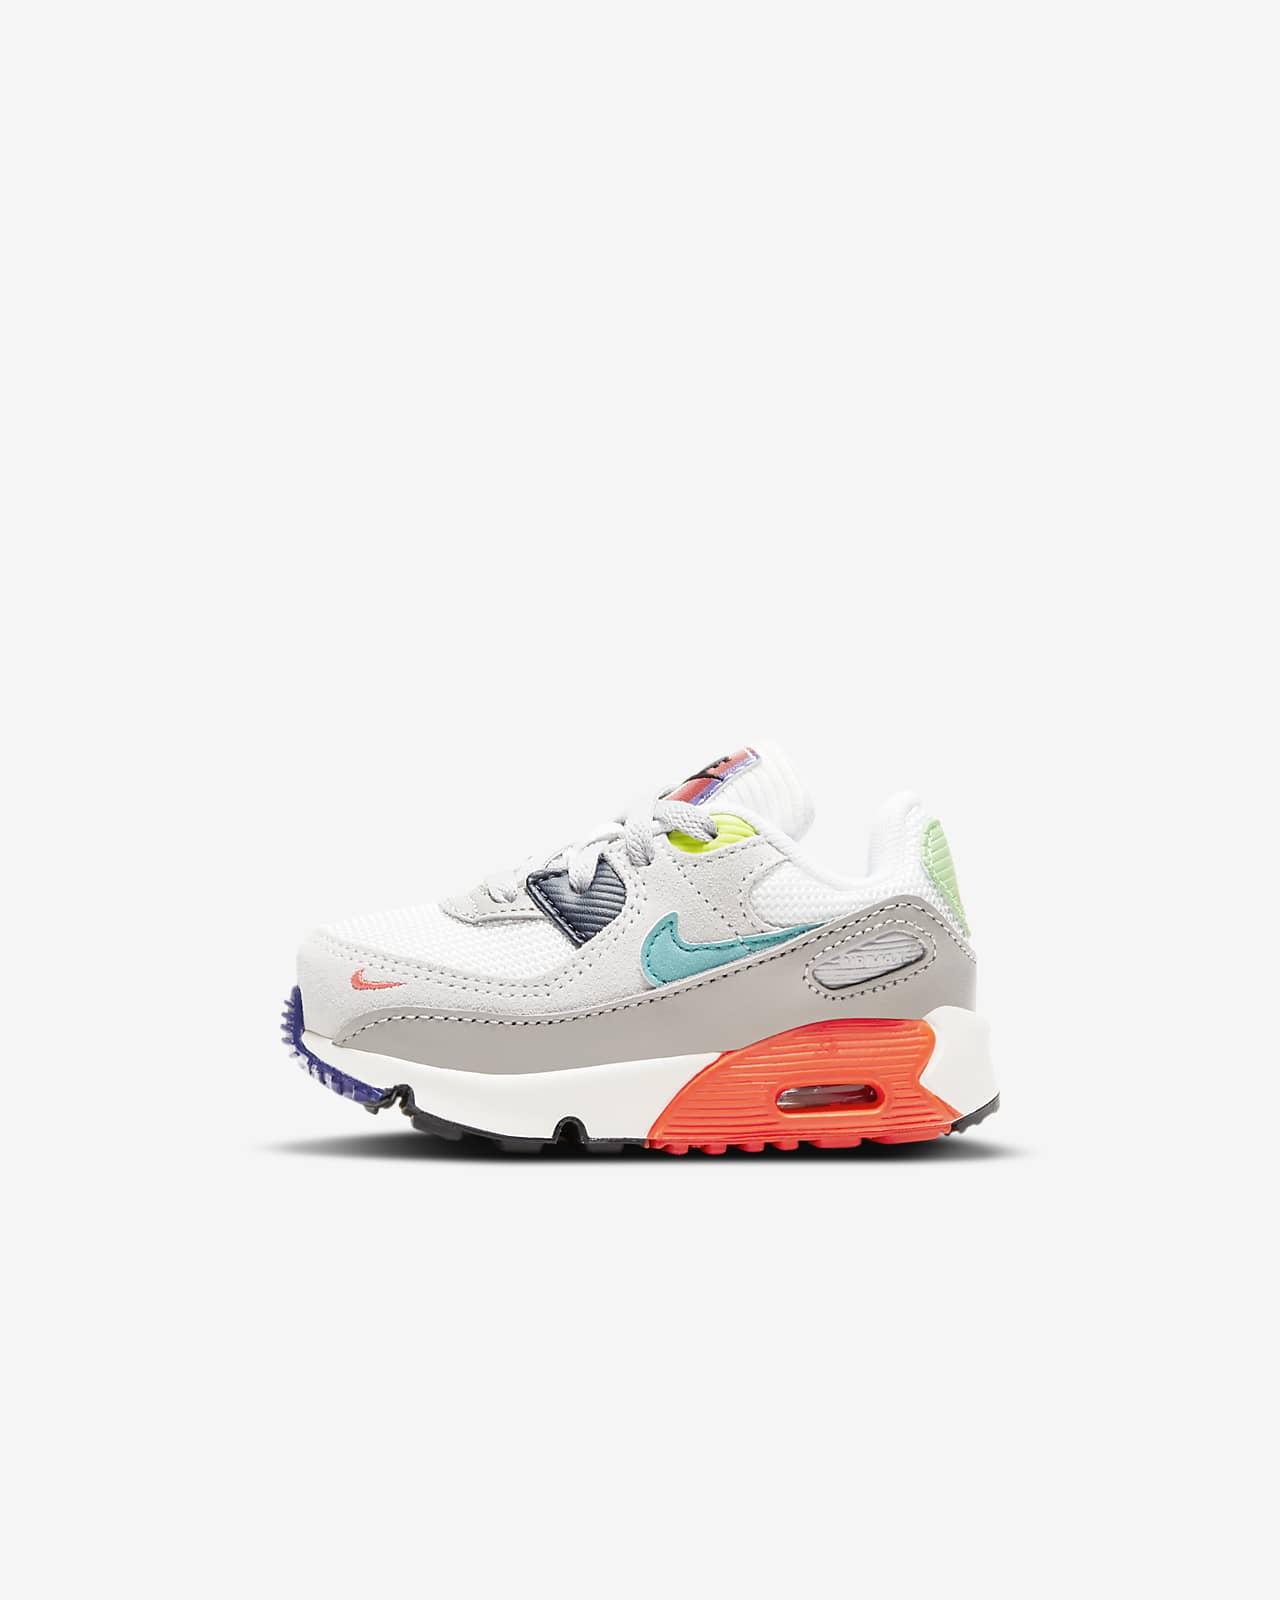 Bota Nike Air Max EOI pro kojence abatolata